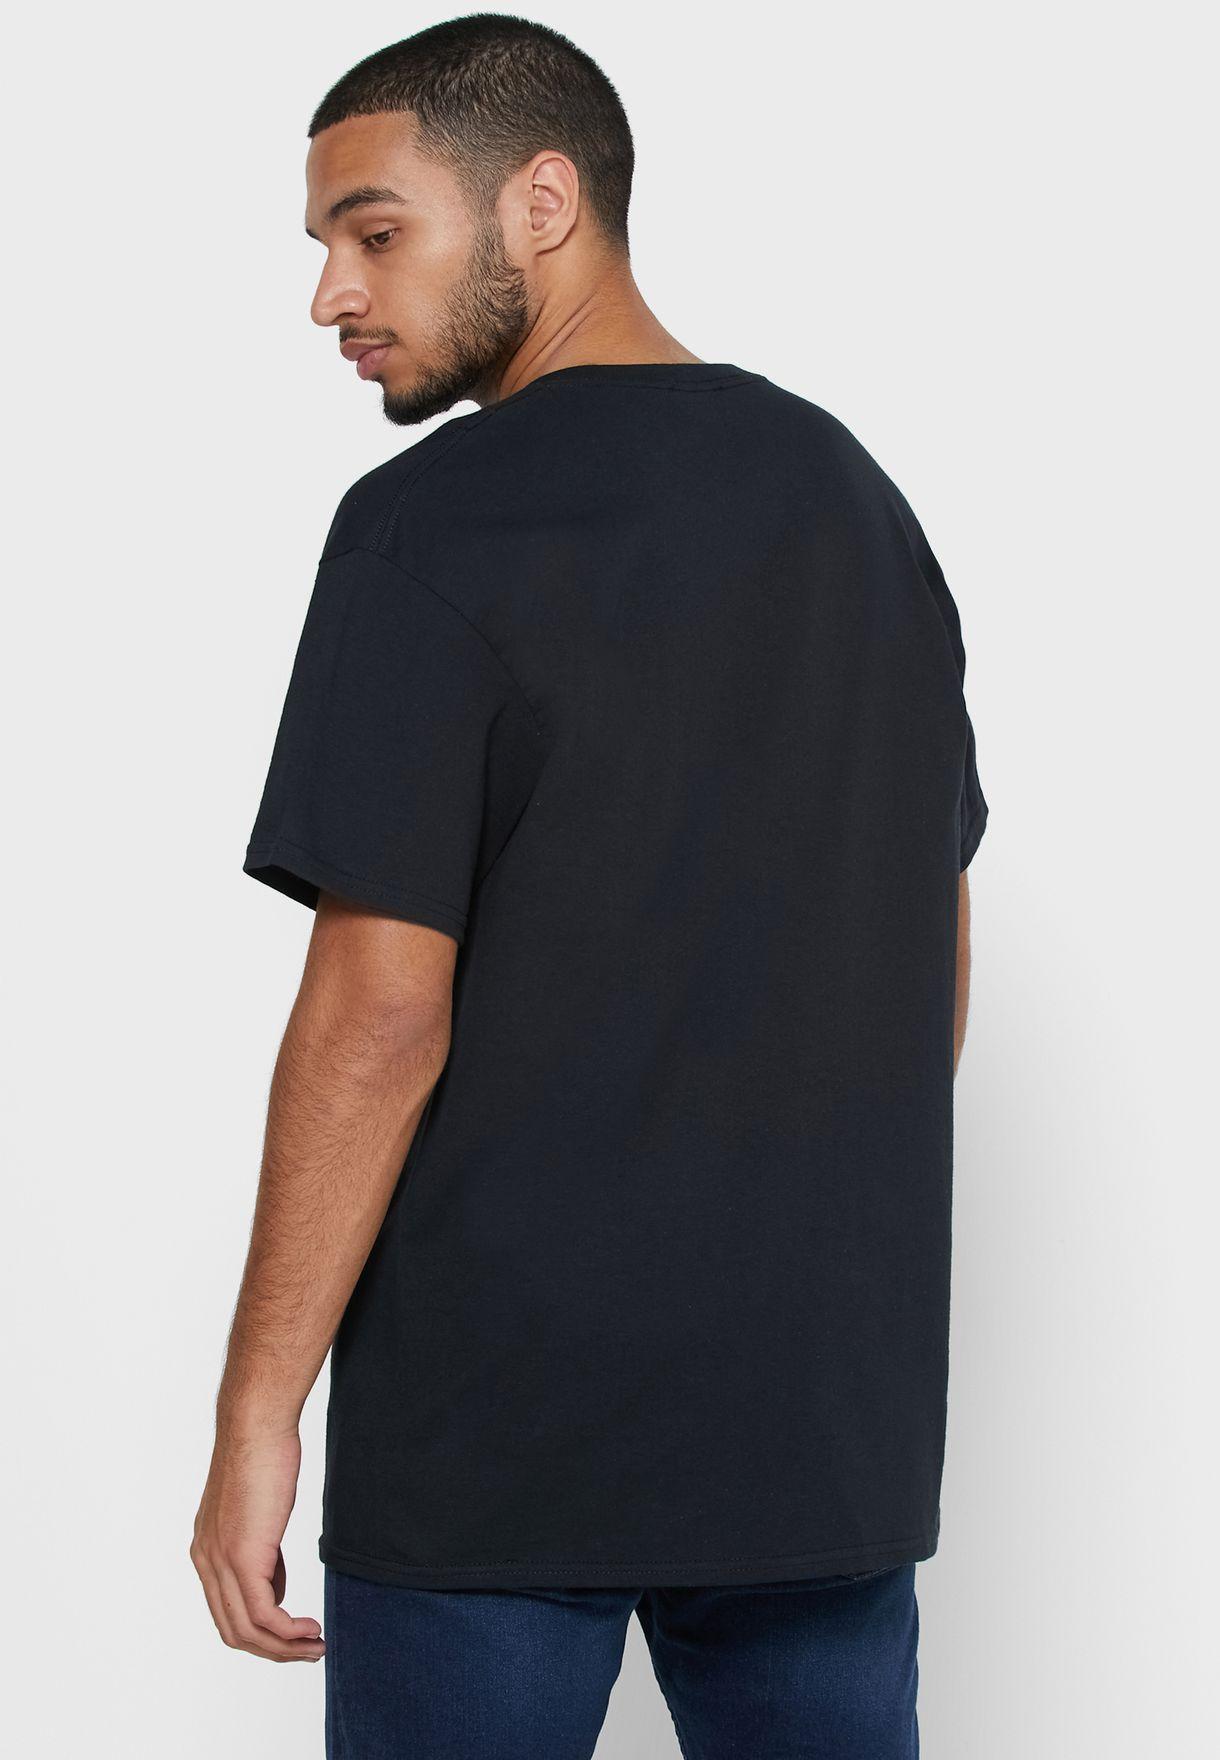 Collective Crew Neck T-Shirt